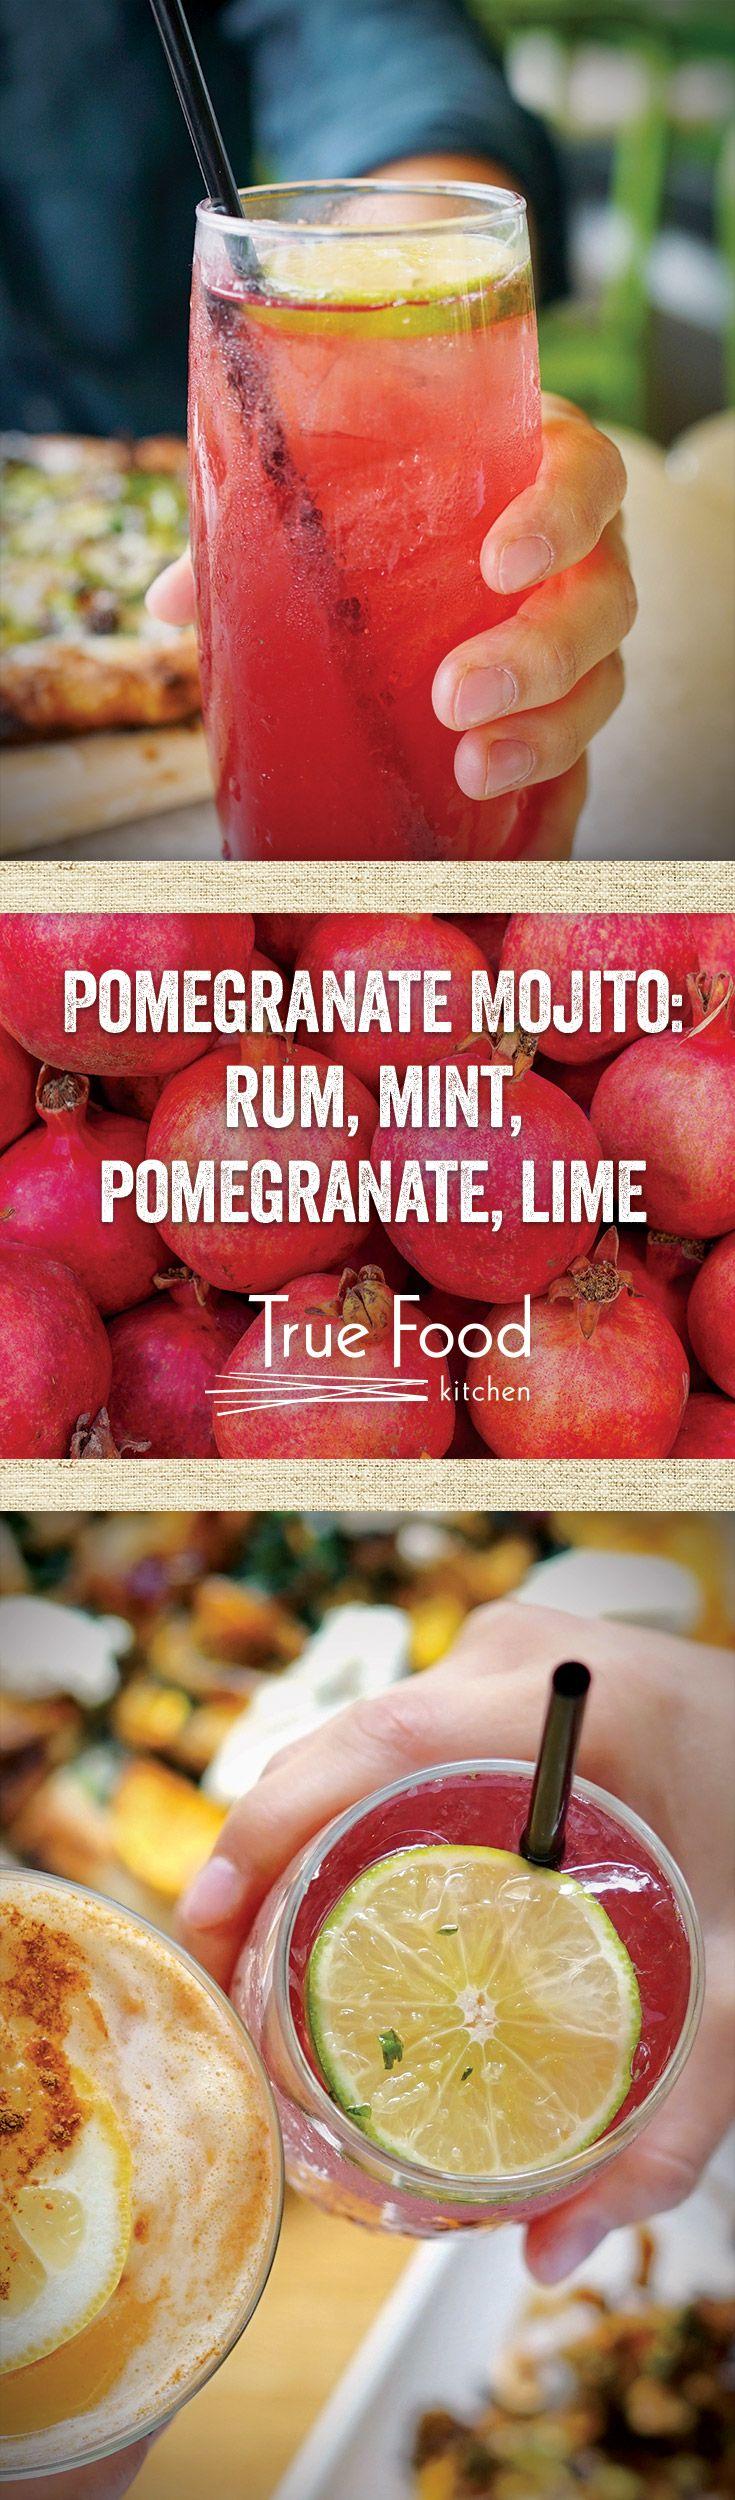 A Pomegranate Party For Your Taste Buds. Dinner MenuTrue ...